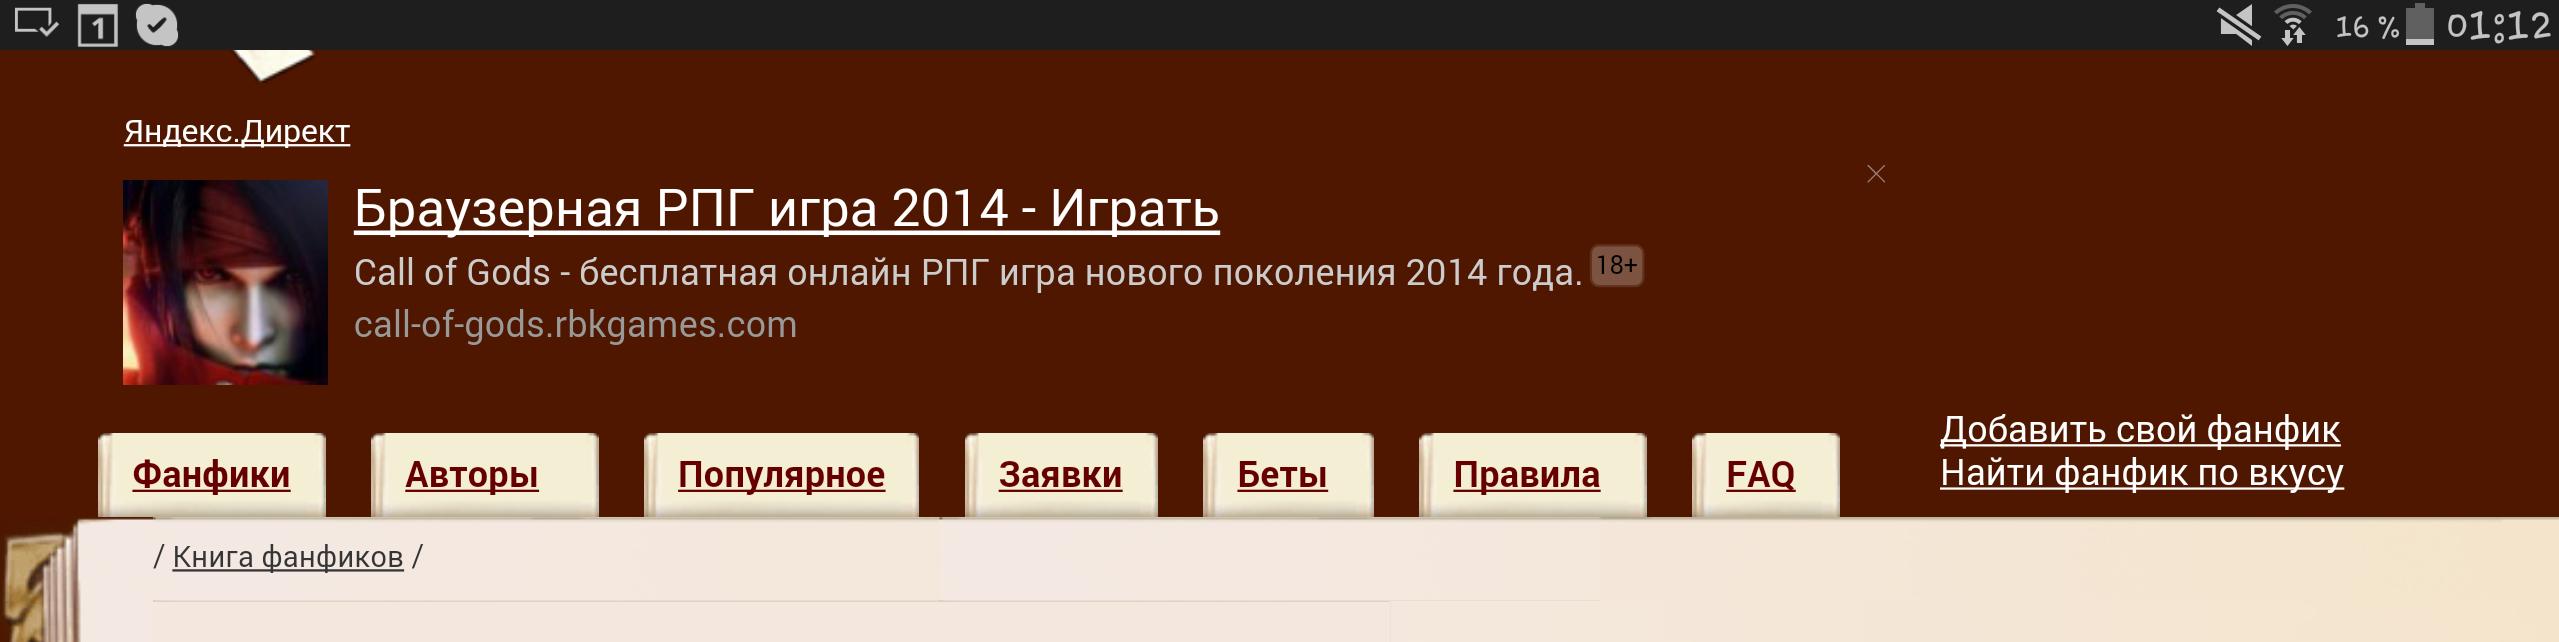 http://i19.servimg.com/u/f19/18/85/26/48/screen10.png